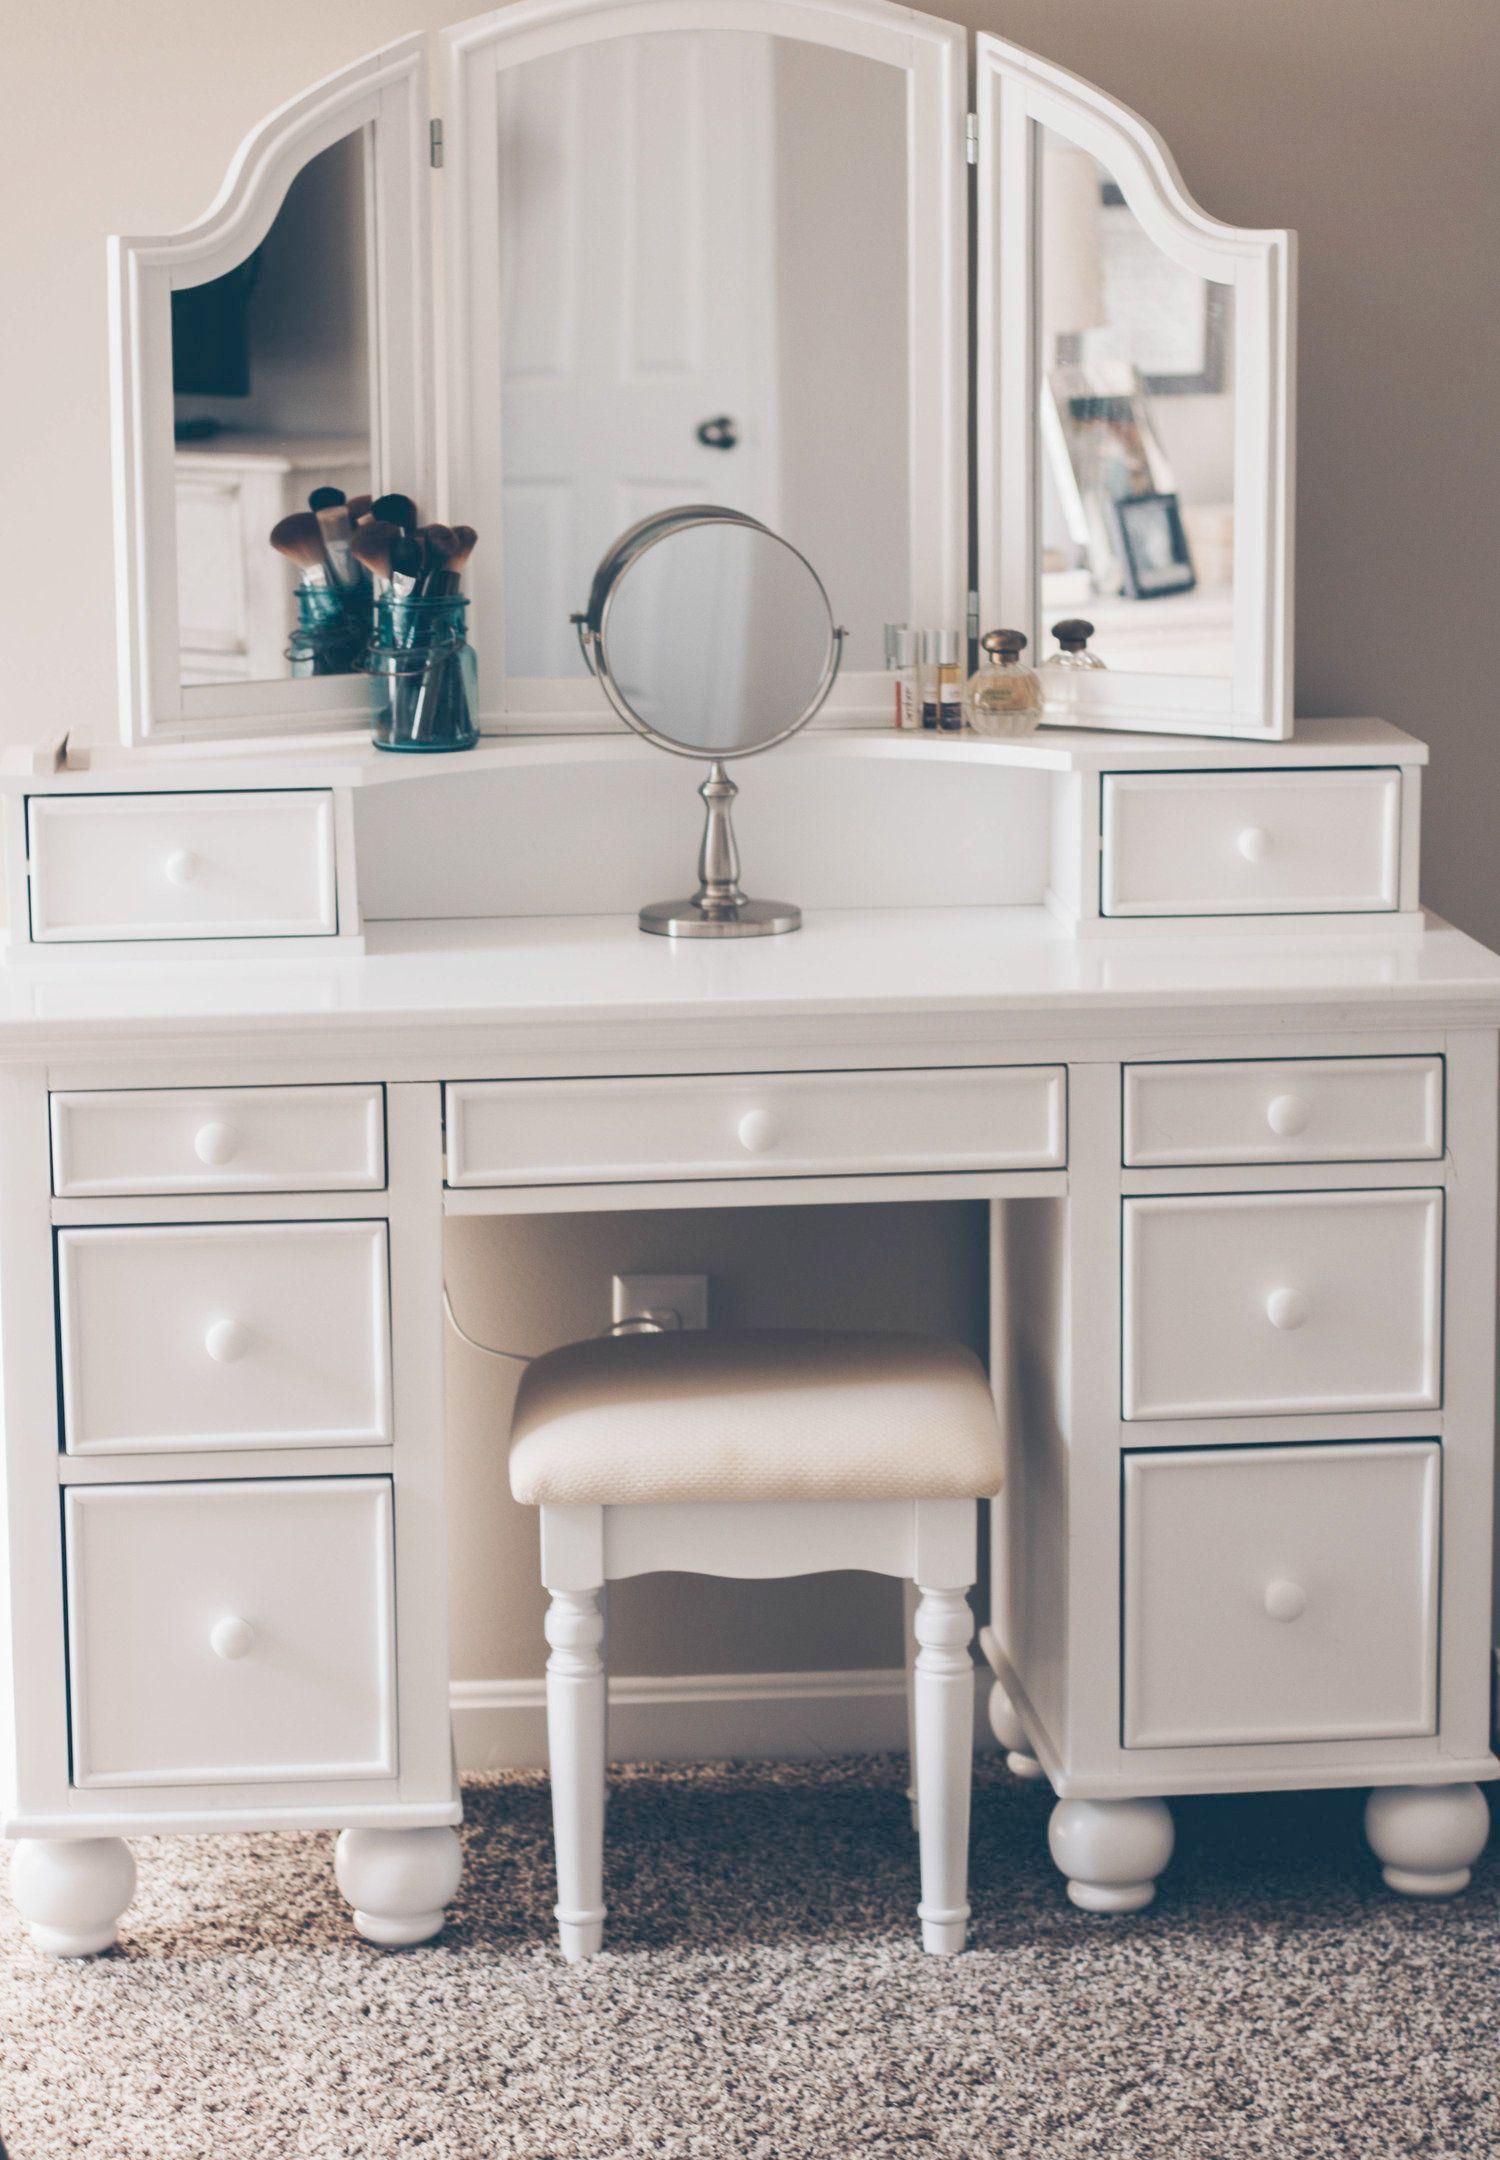 Professional Makeup Vanity Mirror Till Makeup Brushes Kim